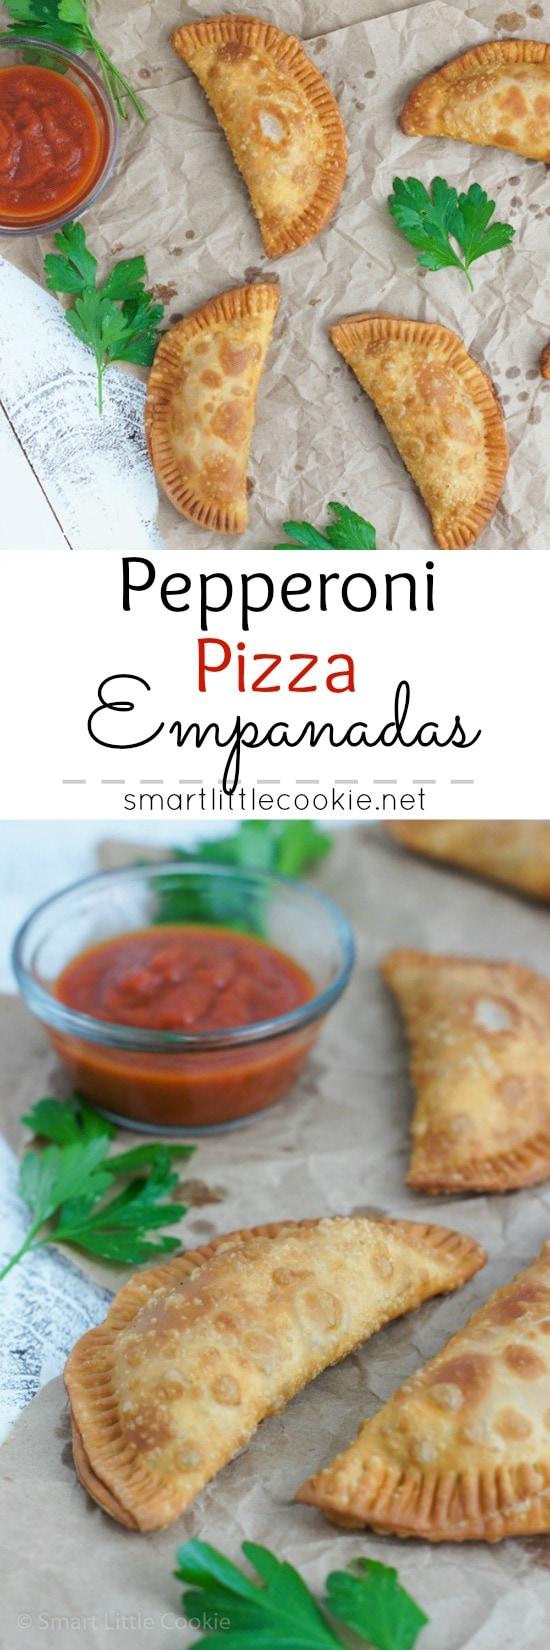 Pepperoni Pizza Empanadas |smartlittlecookie.net